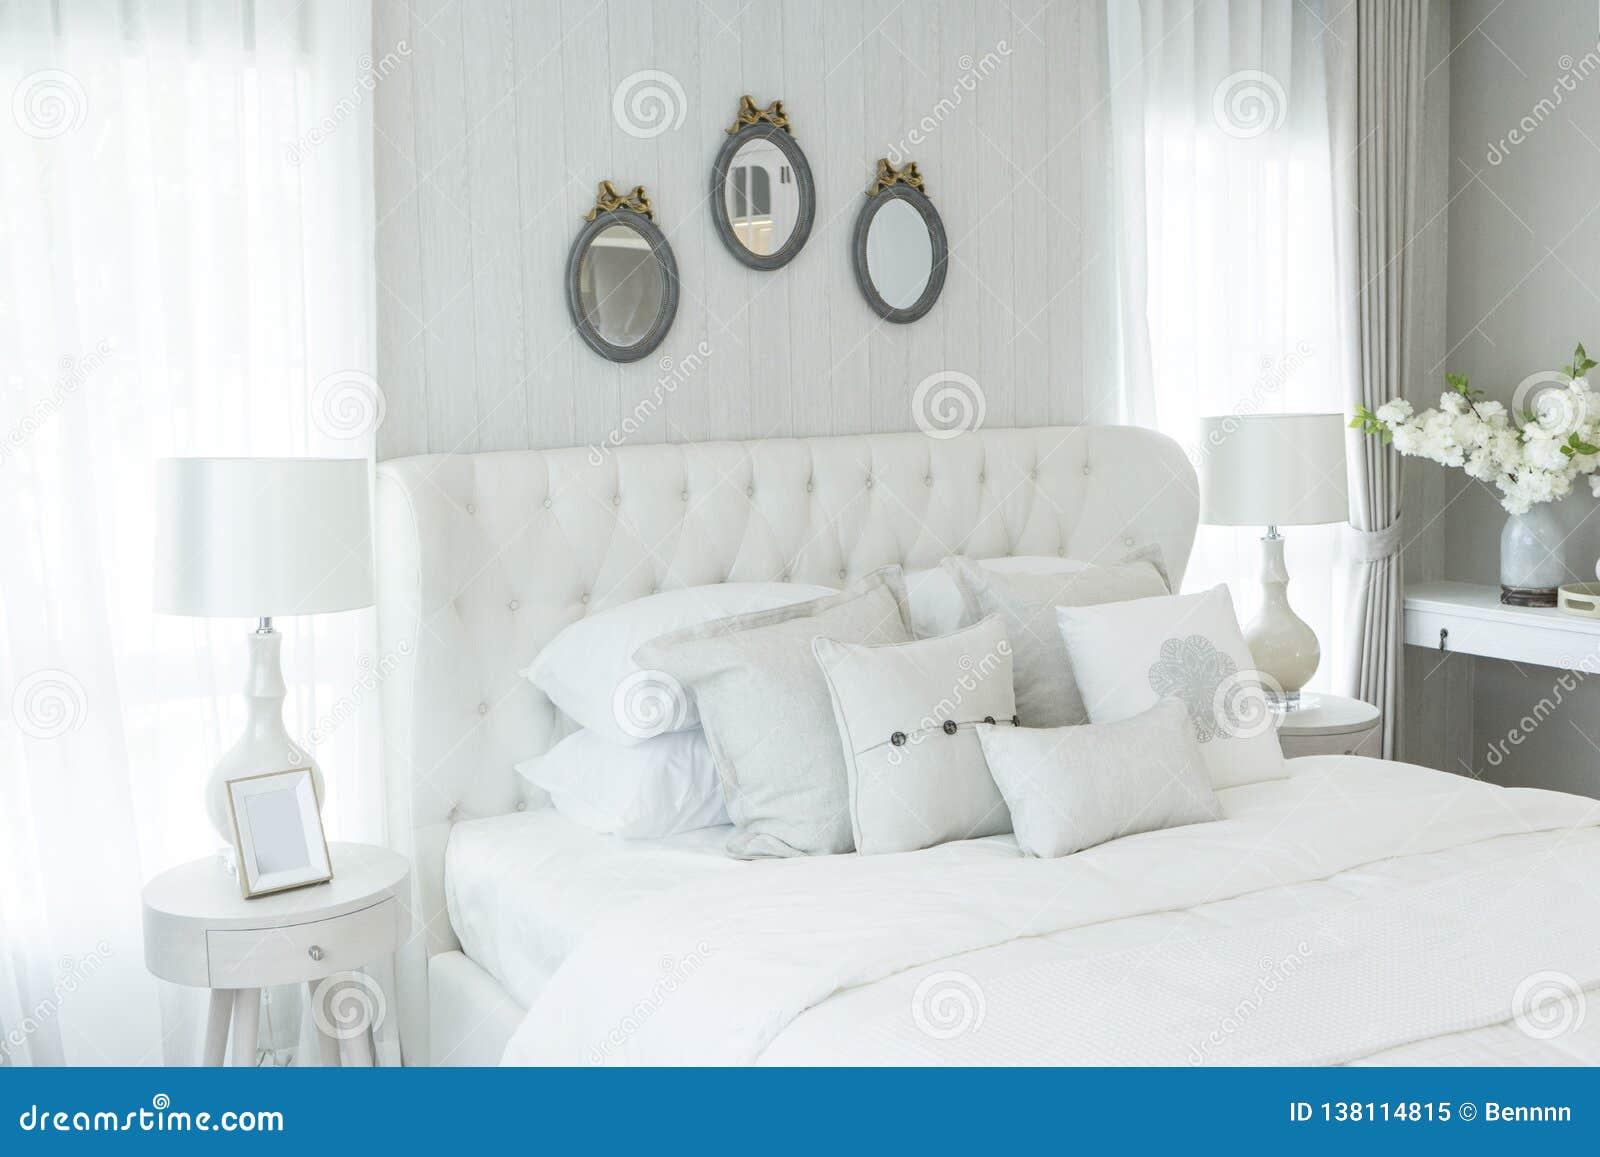 White Elegance English Style Bedroom Stock Image Image Of Room